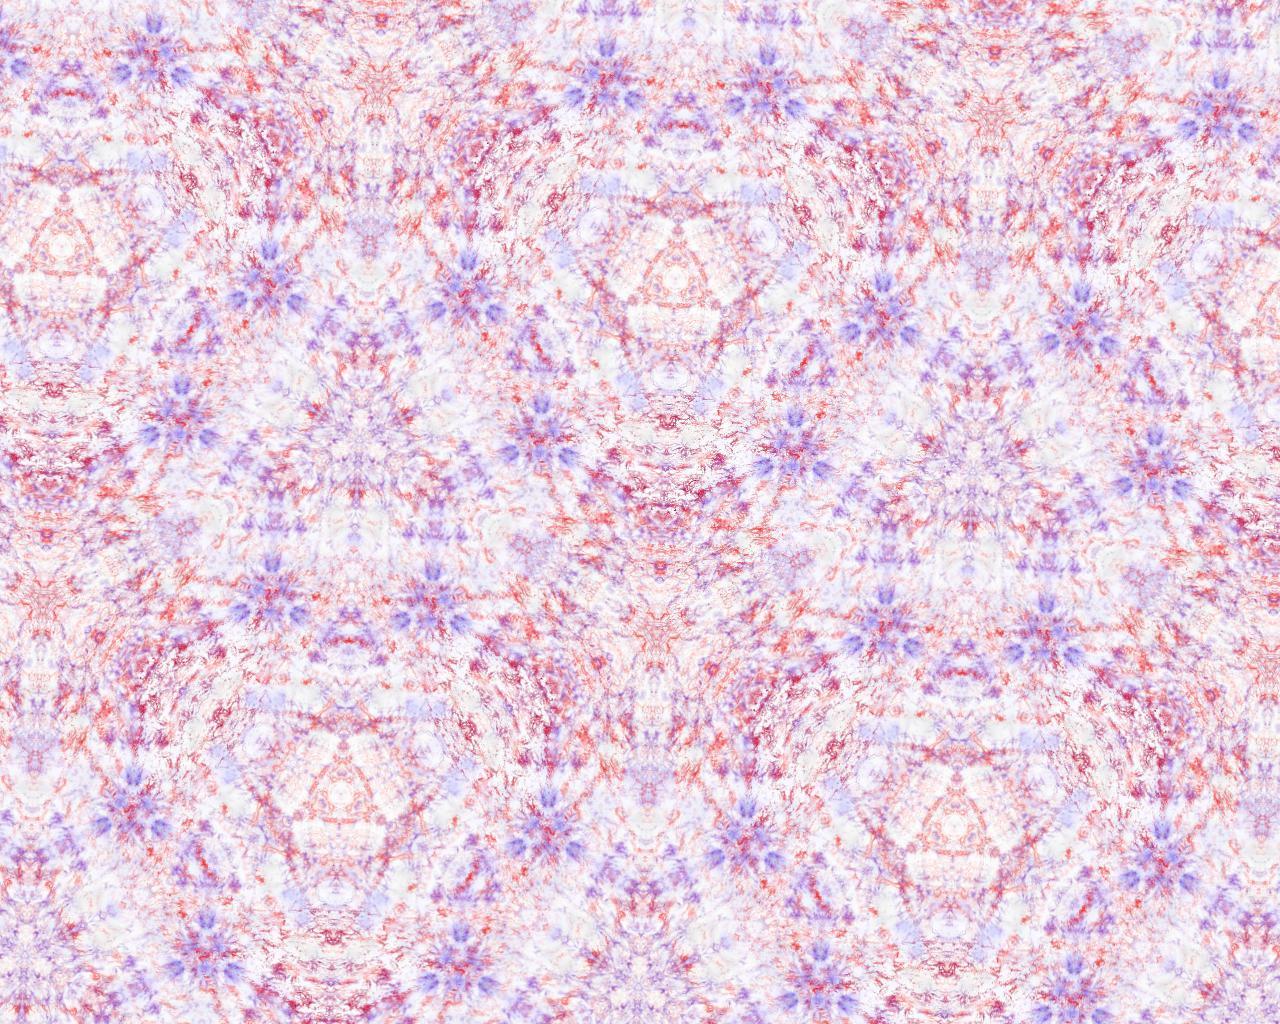 Pastel Pattern By SedrickInfinity